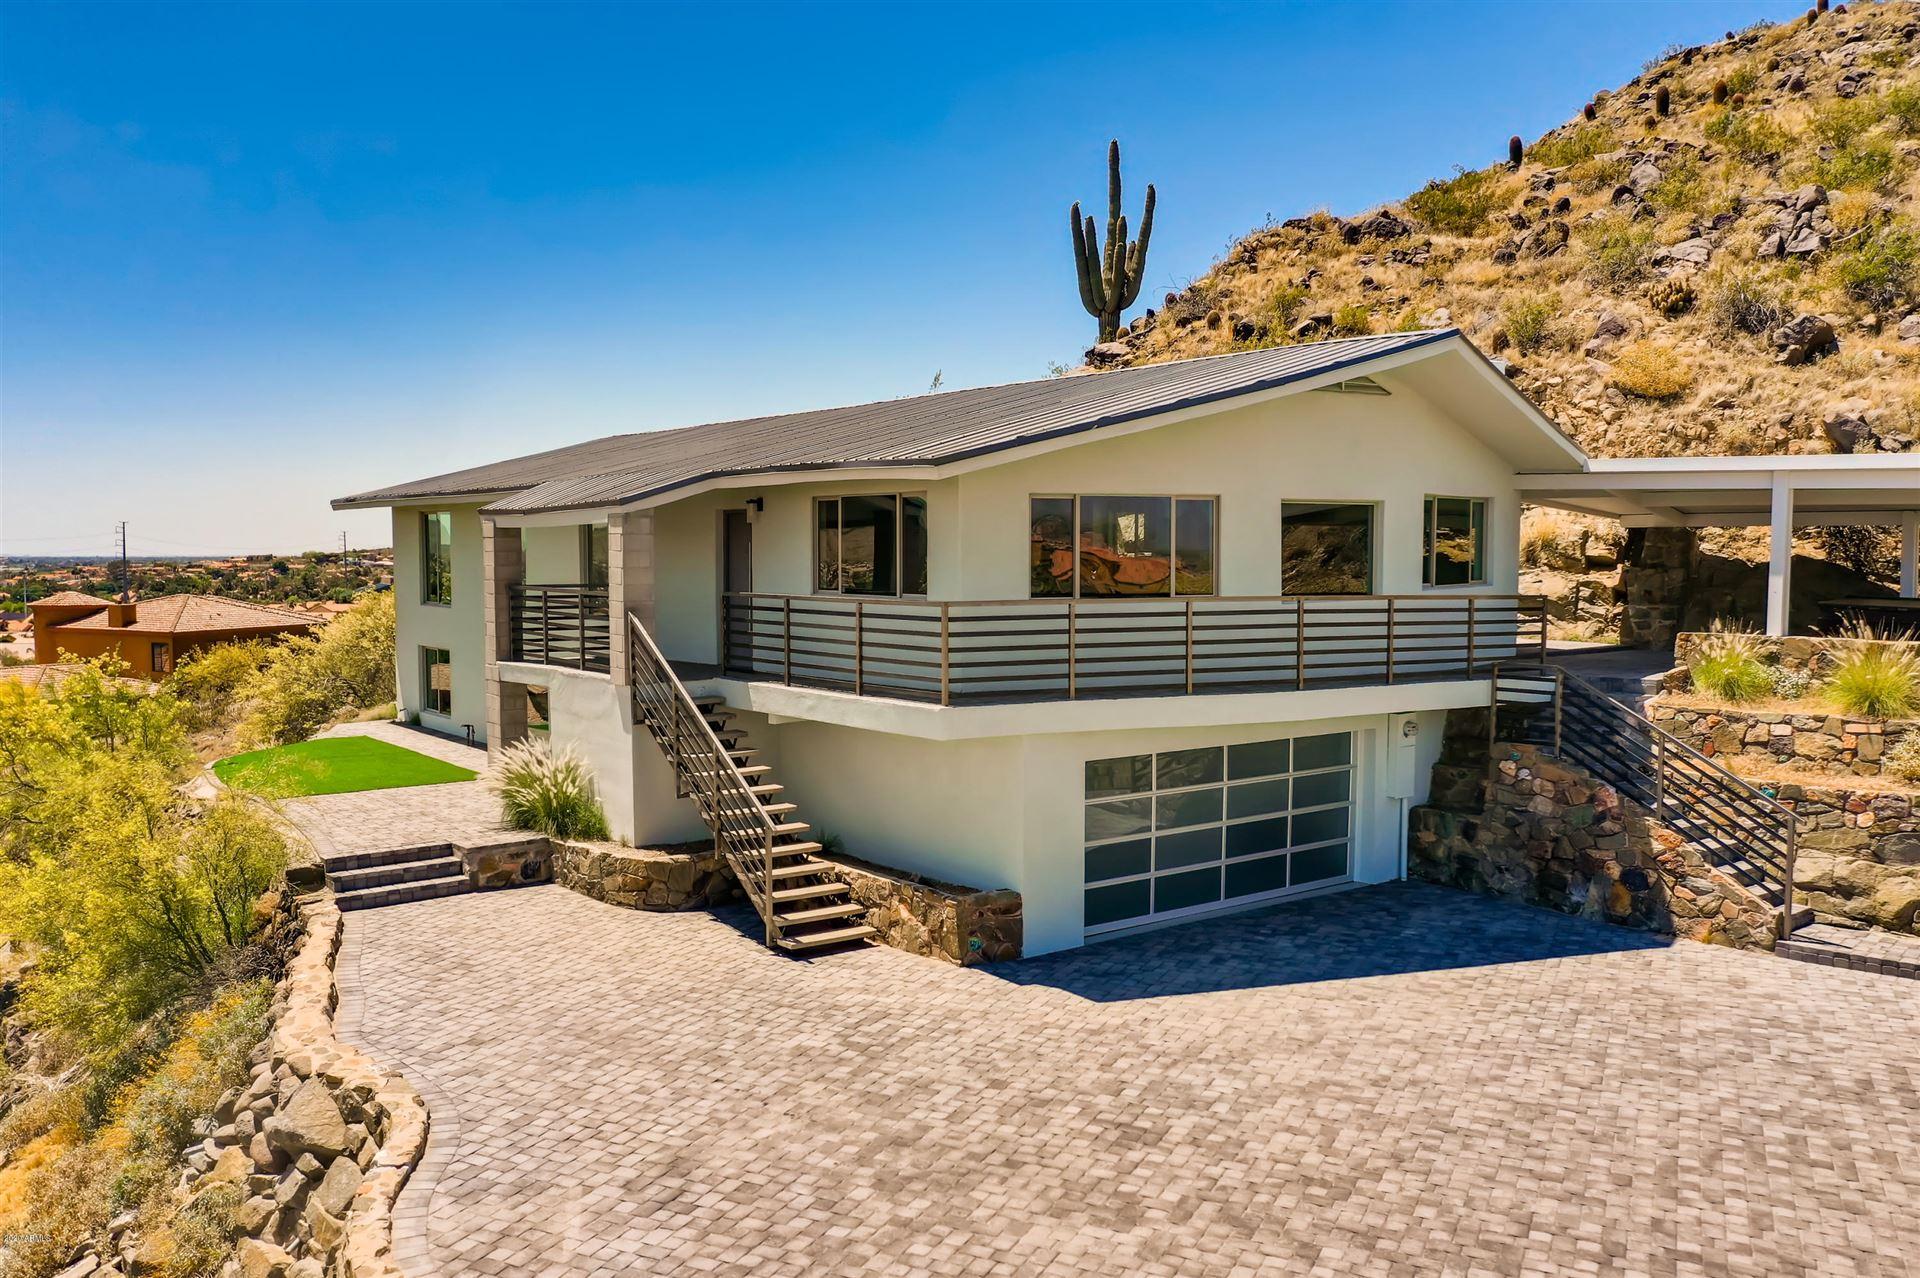 18810 N 22ND Street, Phoenix, AZ 85024 - MLS#: 6075821